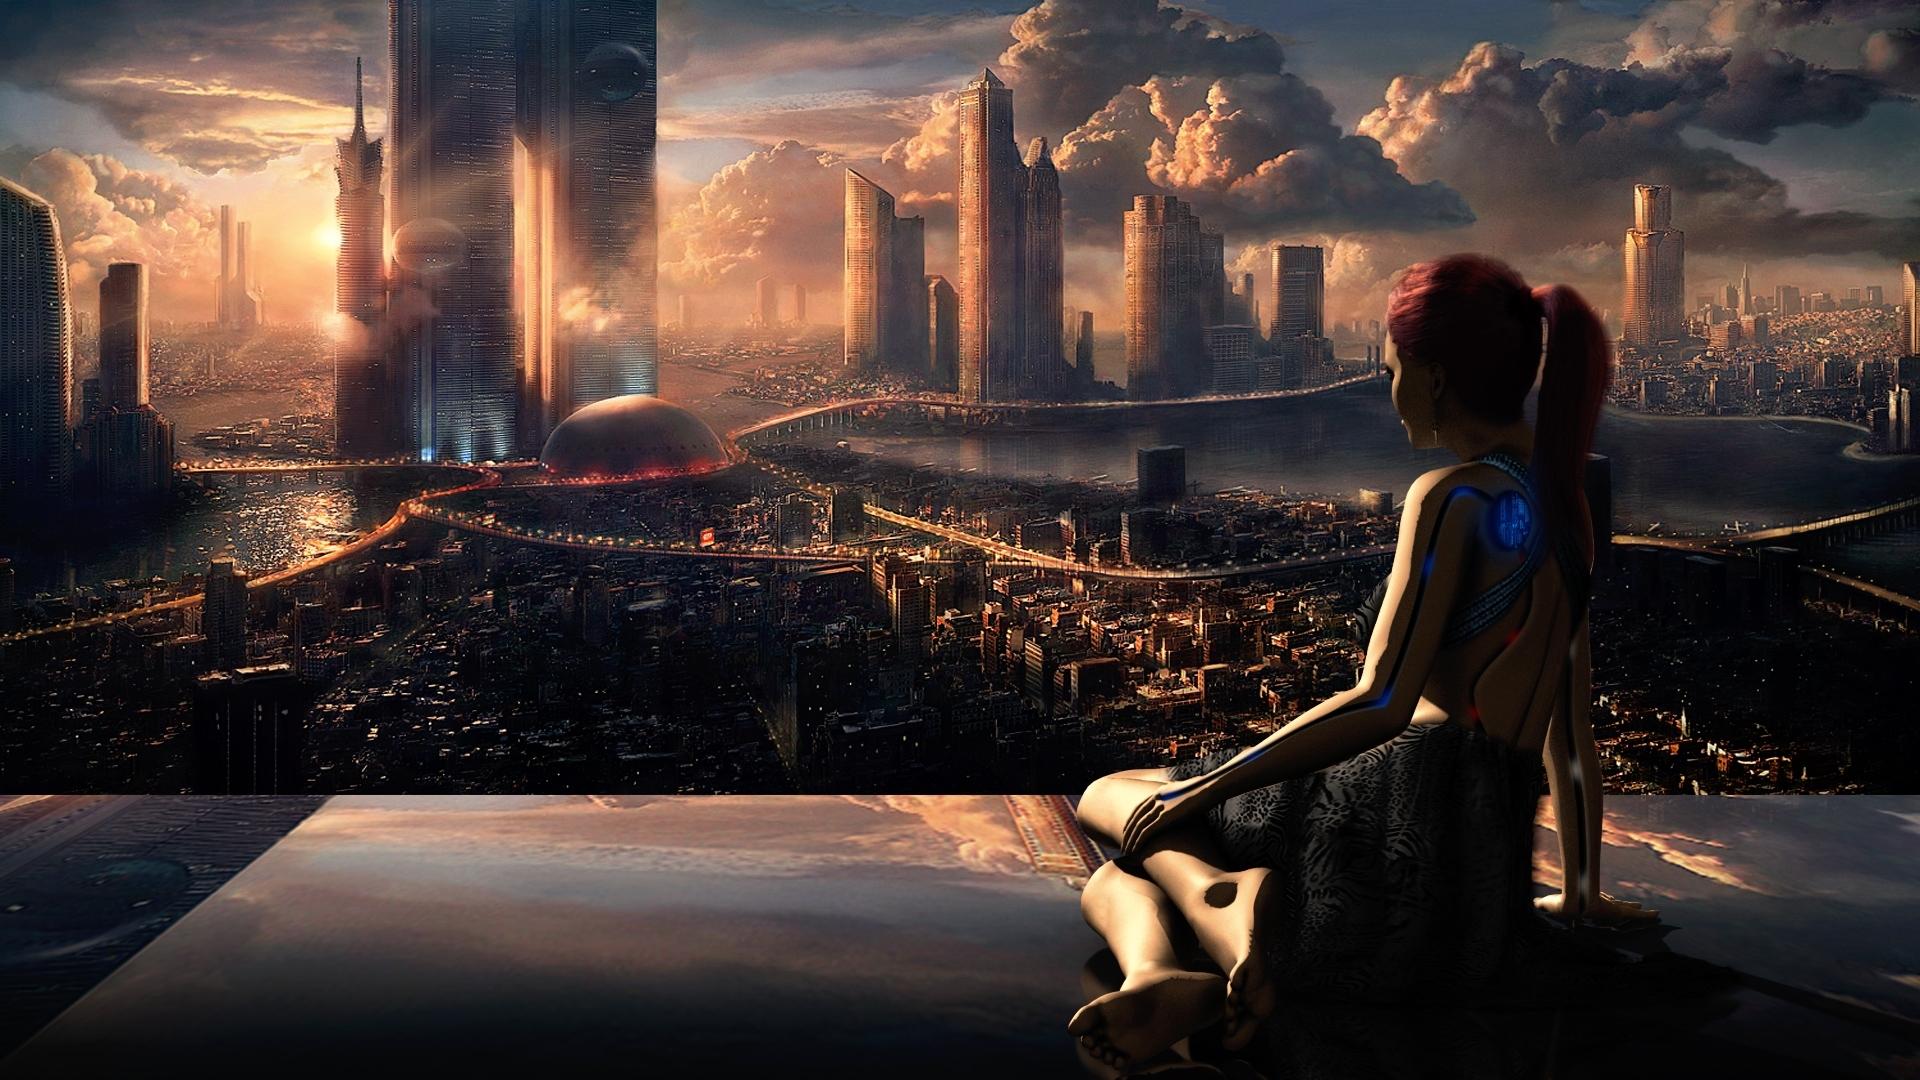 sci fi backgrounds - wallpaper.wiki